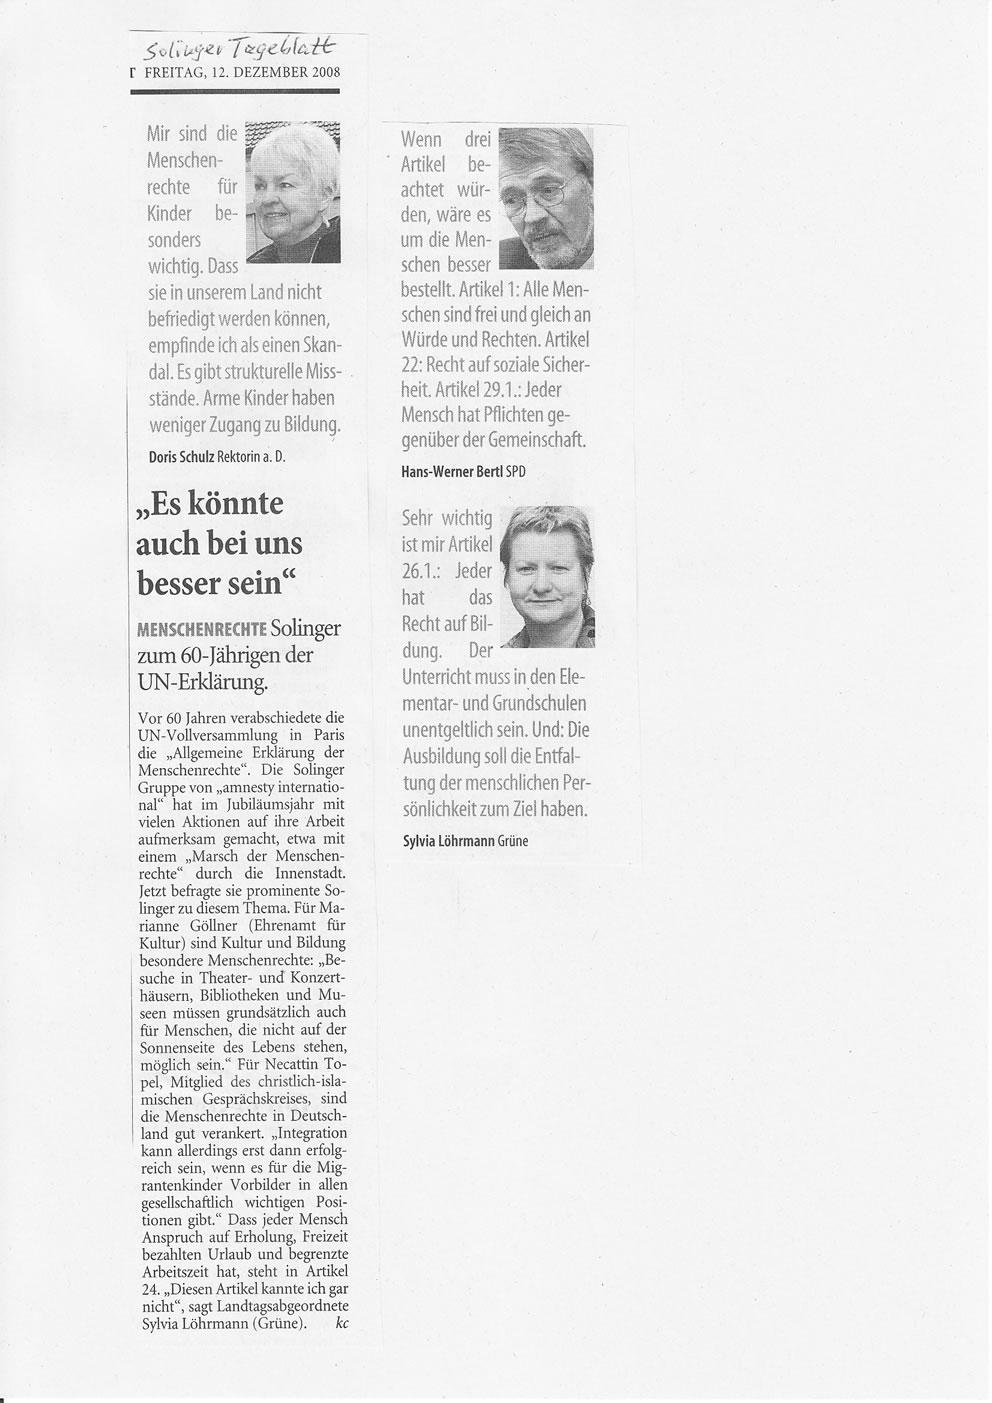 Solinger Tageblatt 12/08: Solinger Promis für Menschenrechte